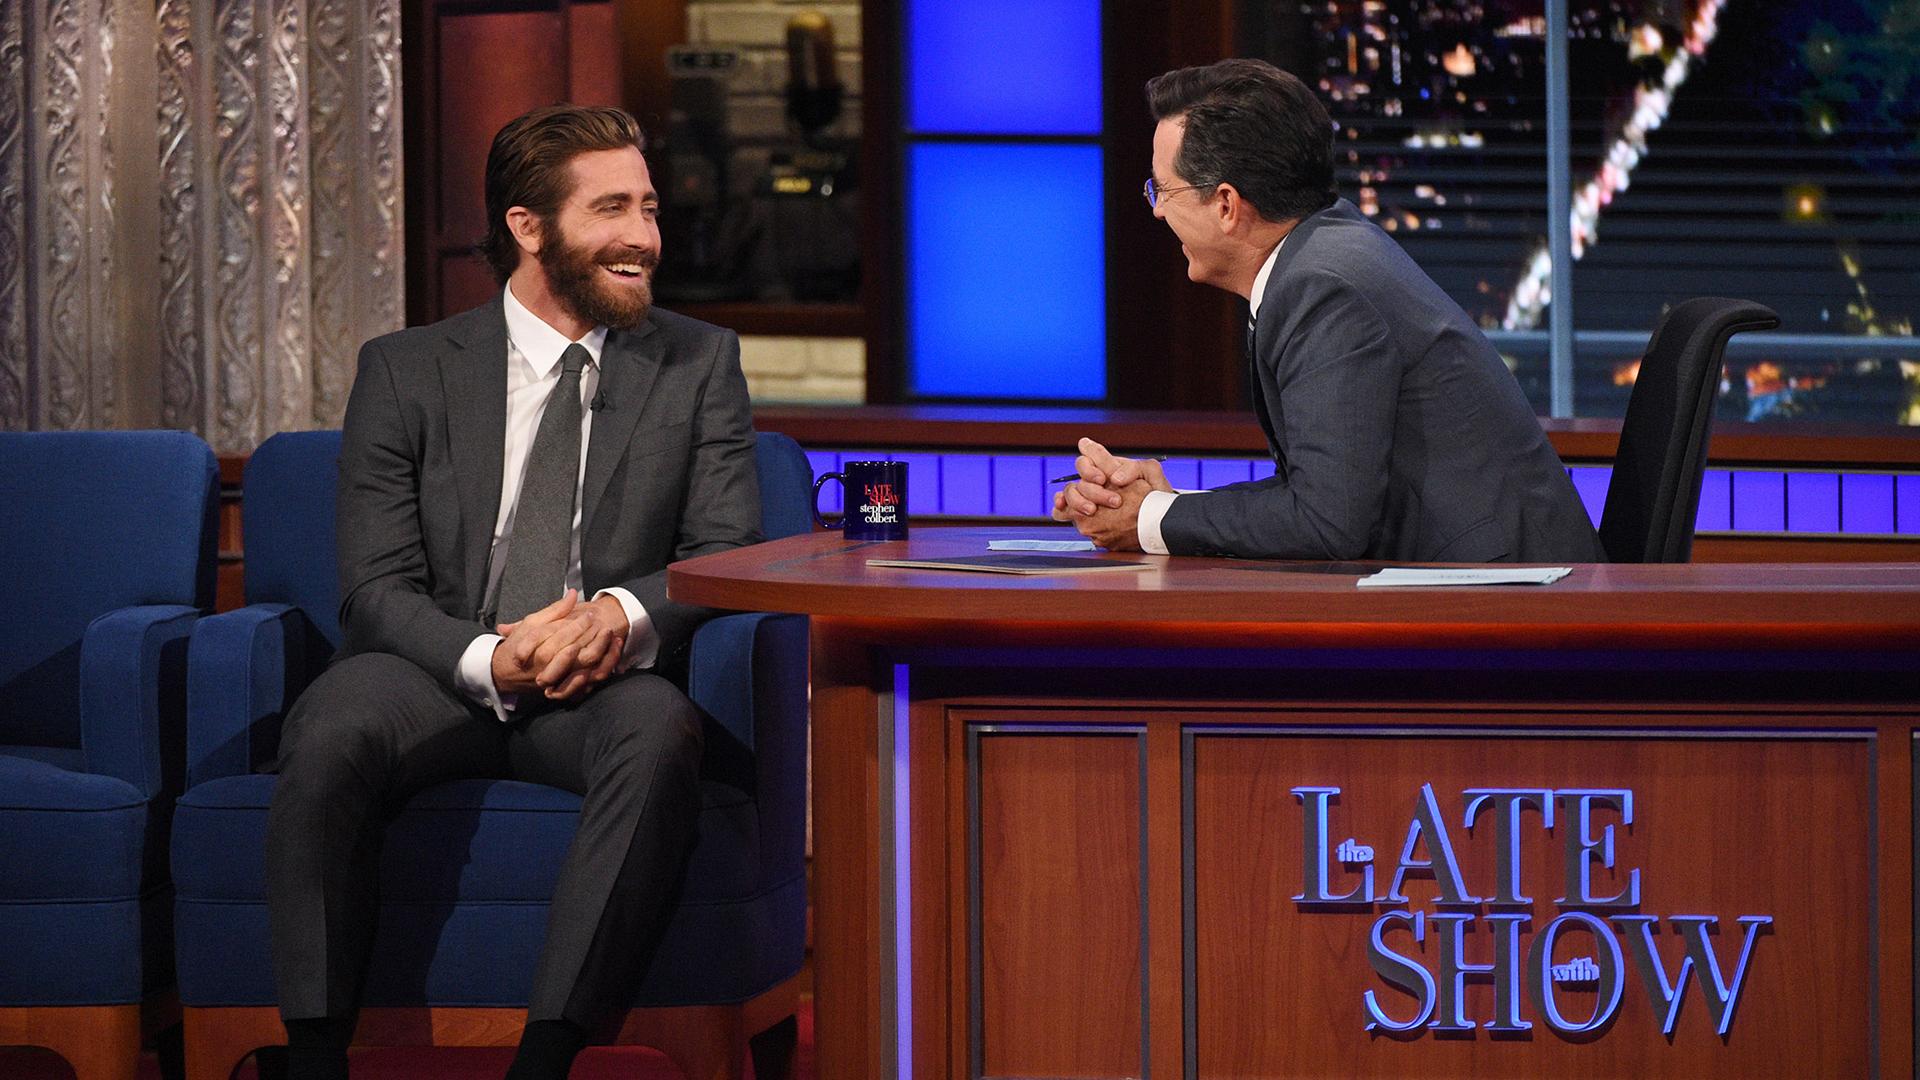 Jake Gyllenhaal and Stephen Colbert